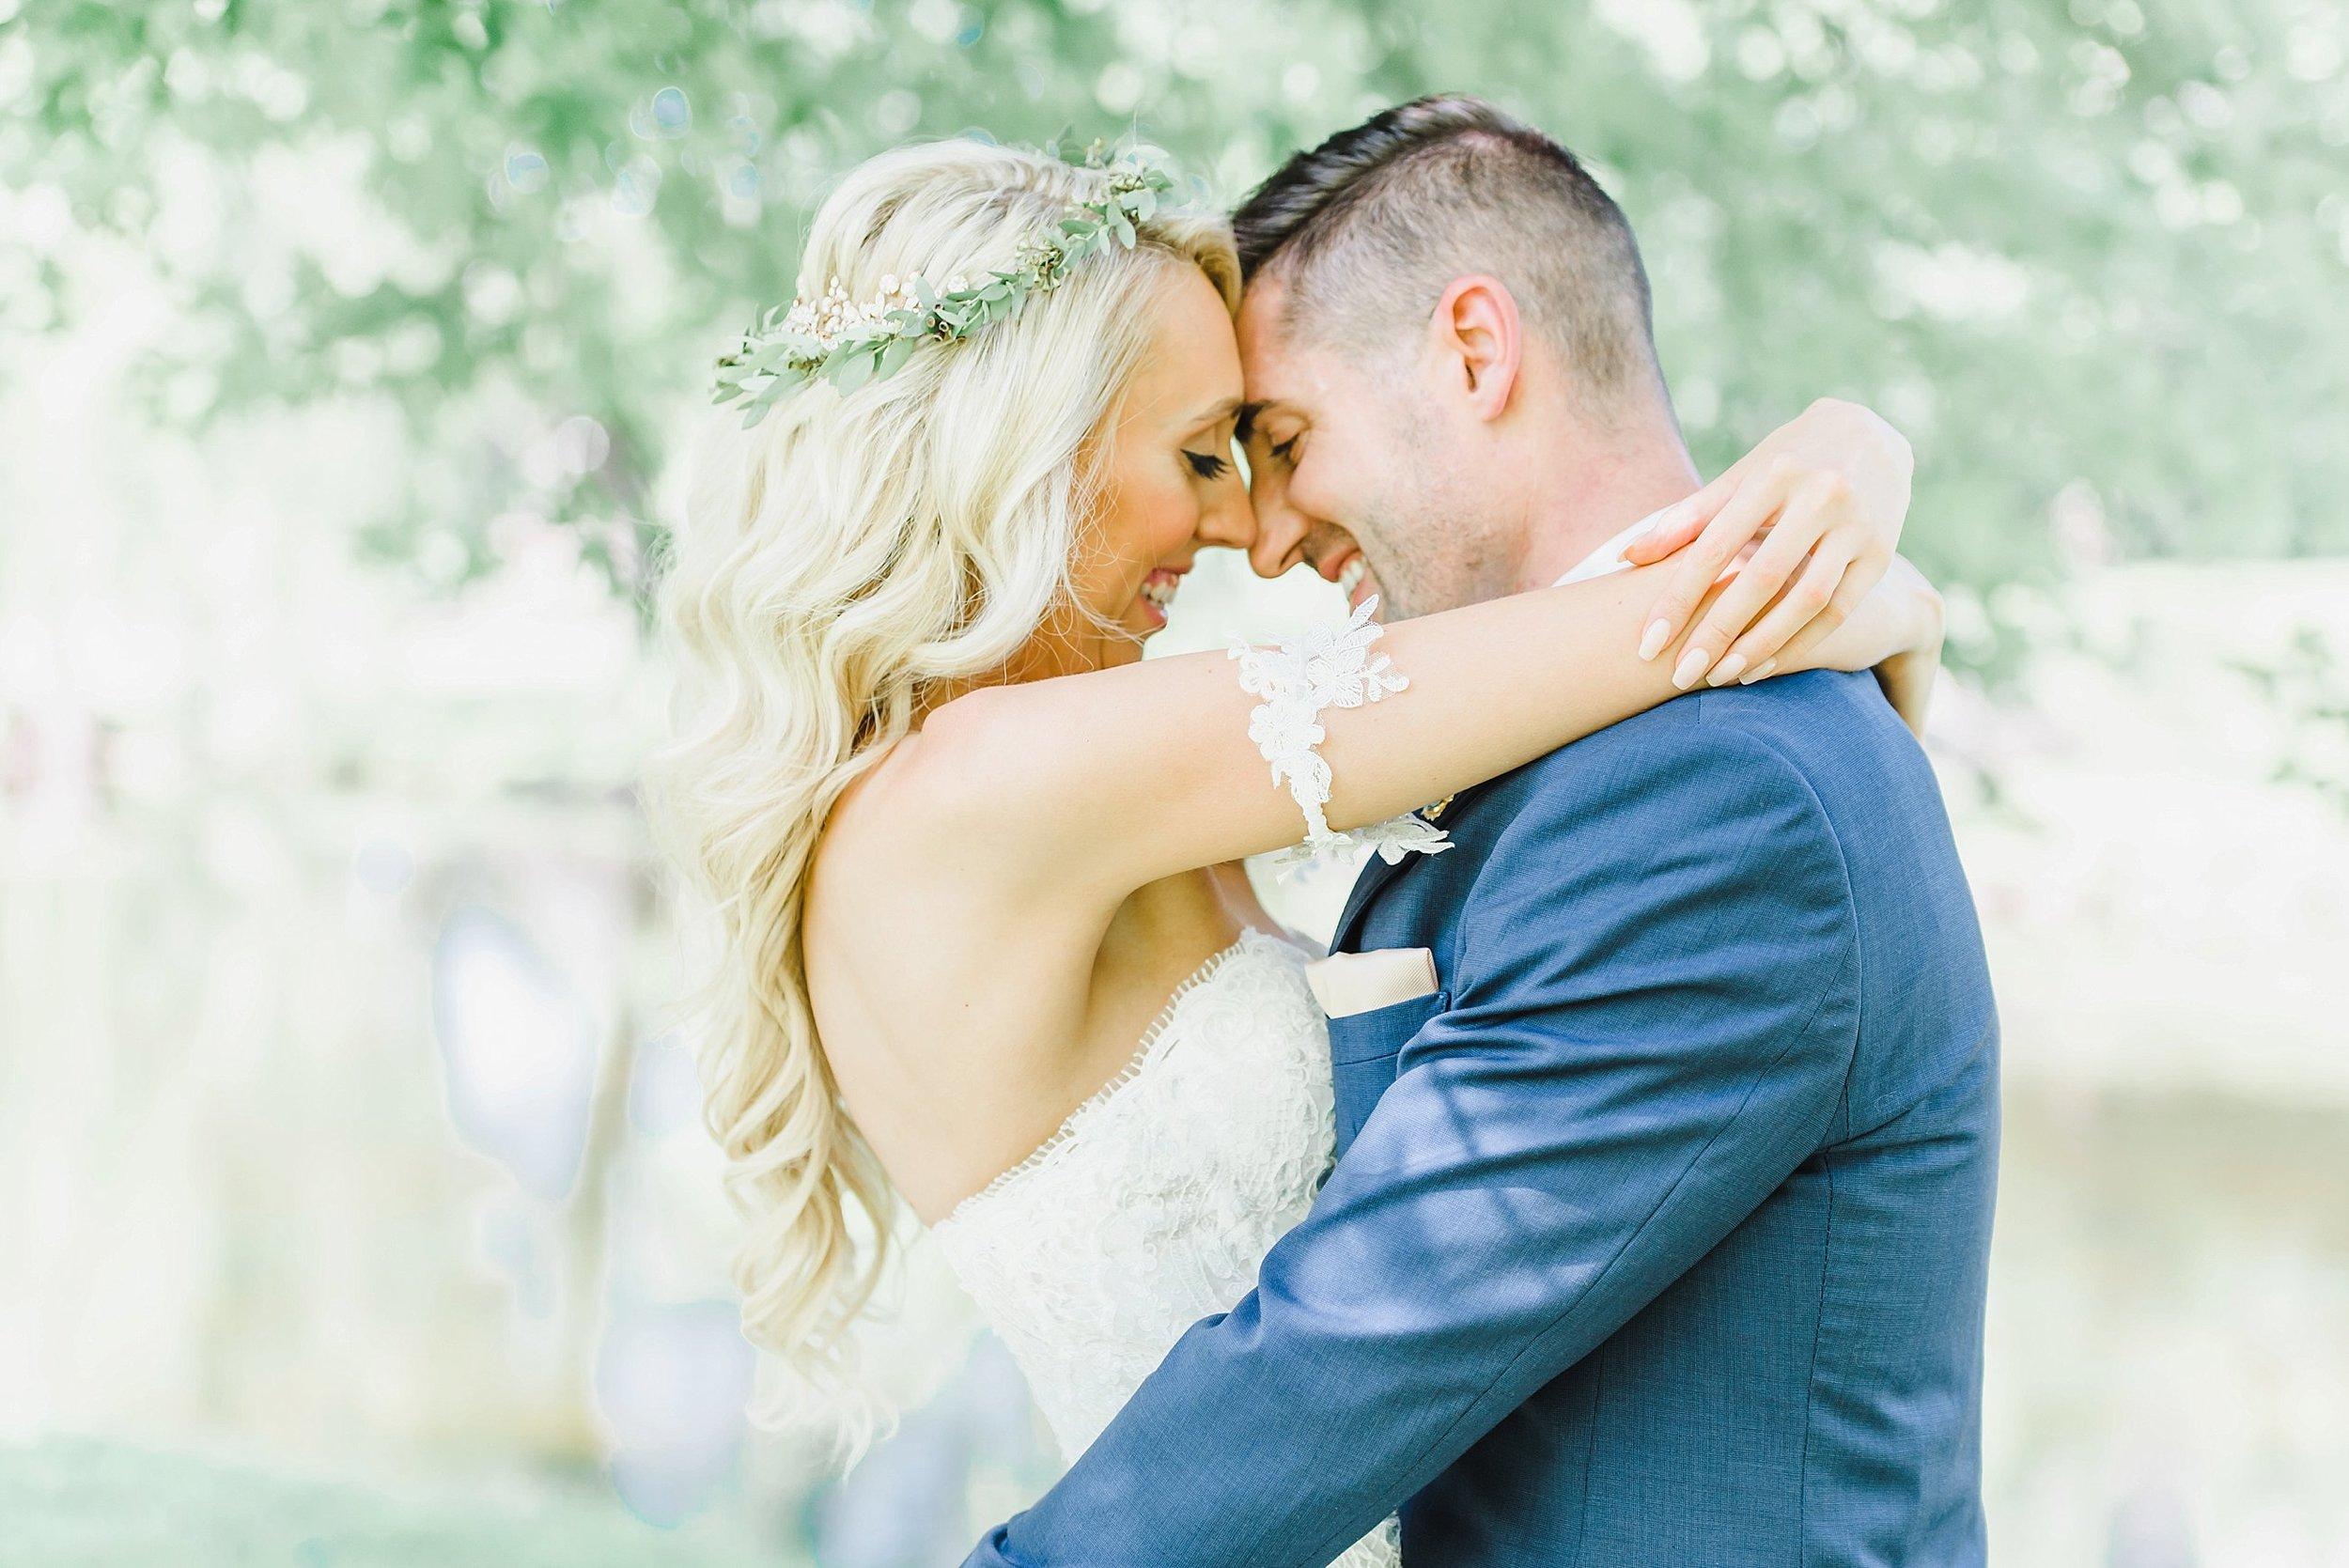 light airy indie fine art ottawa wedding photographer | Ali and Batoul Photography_0049.jpg